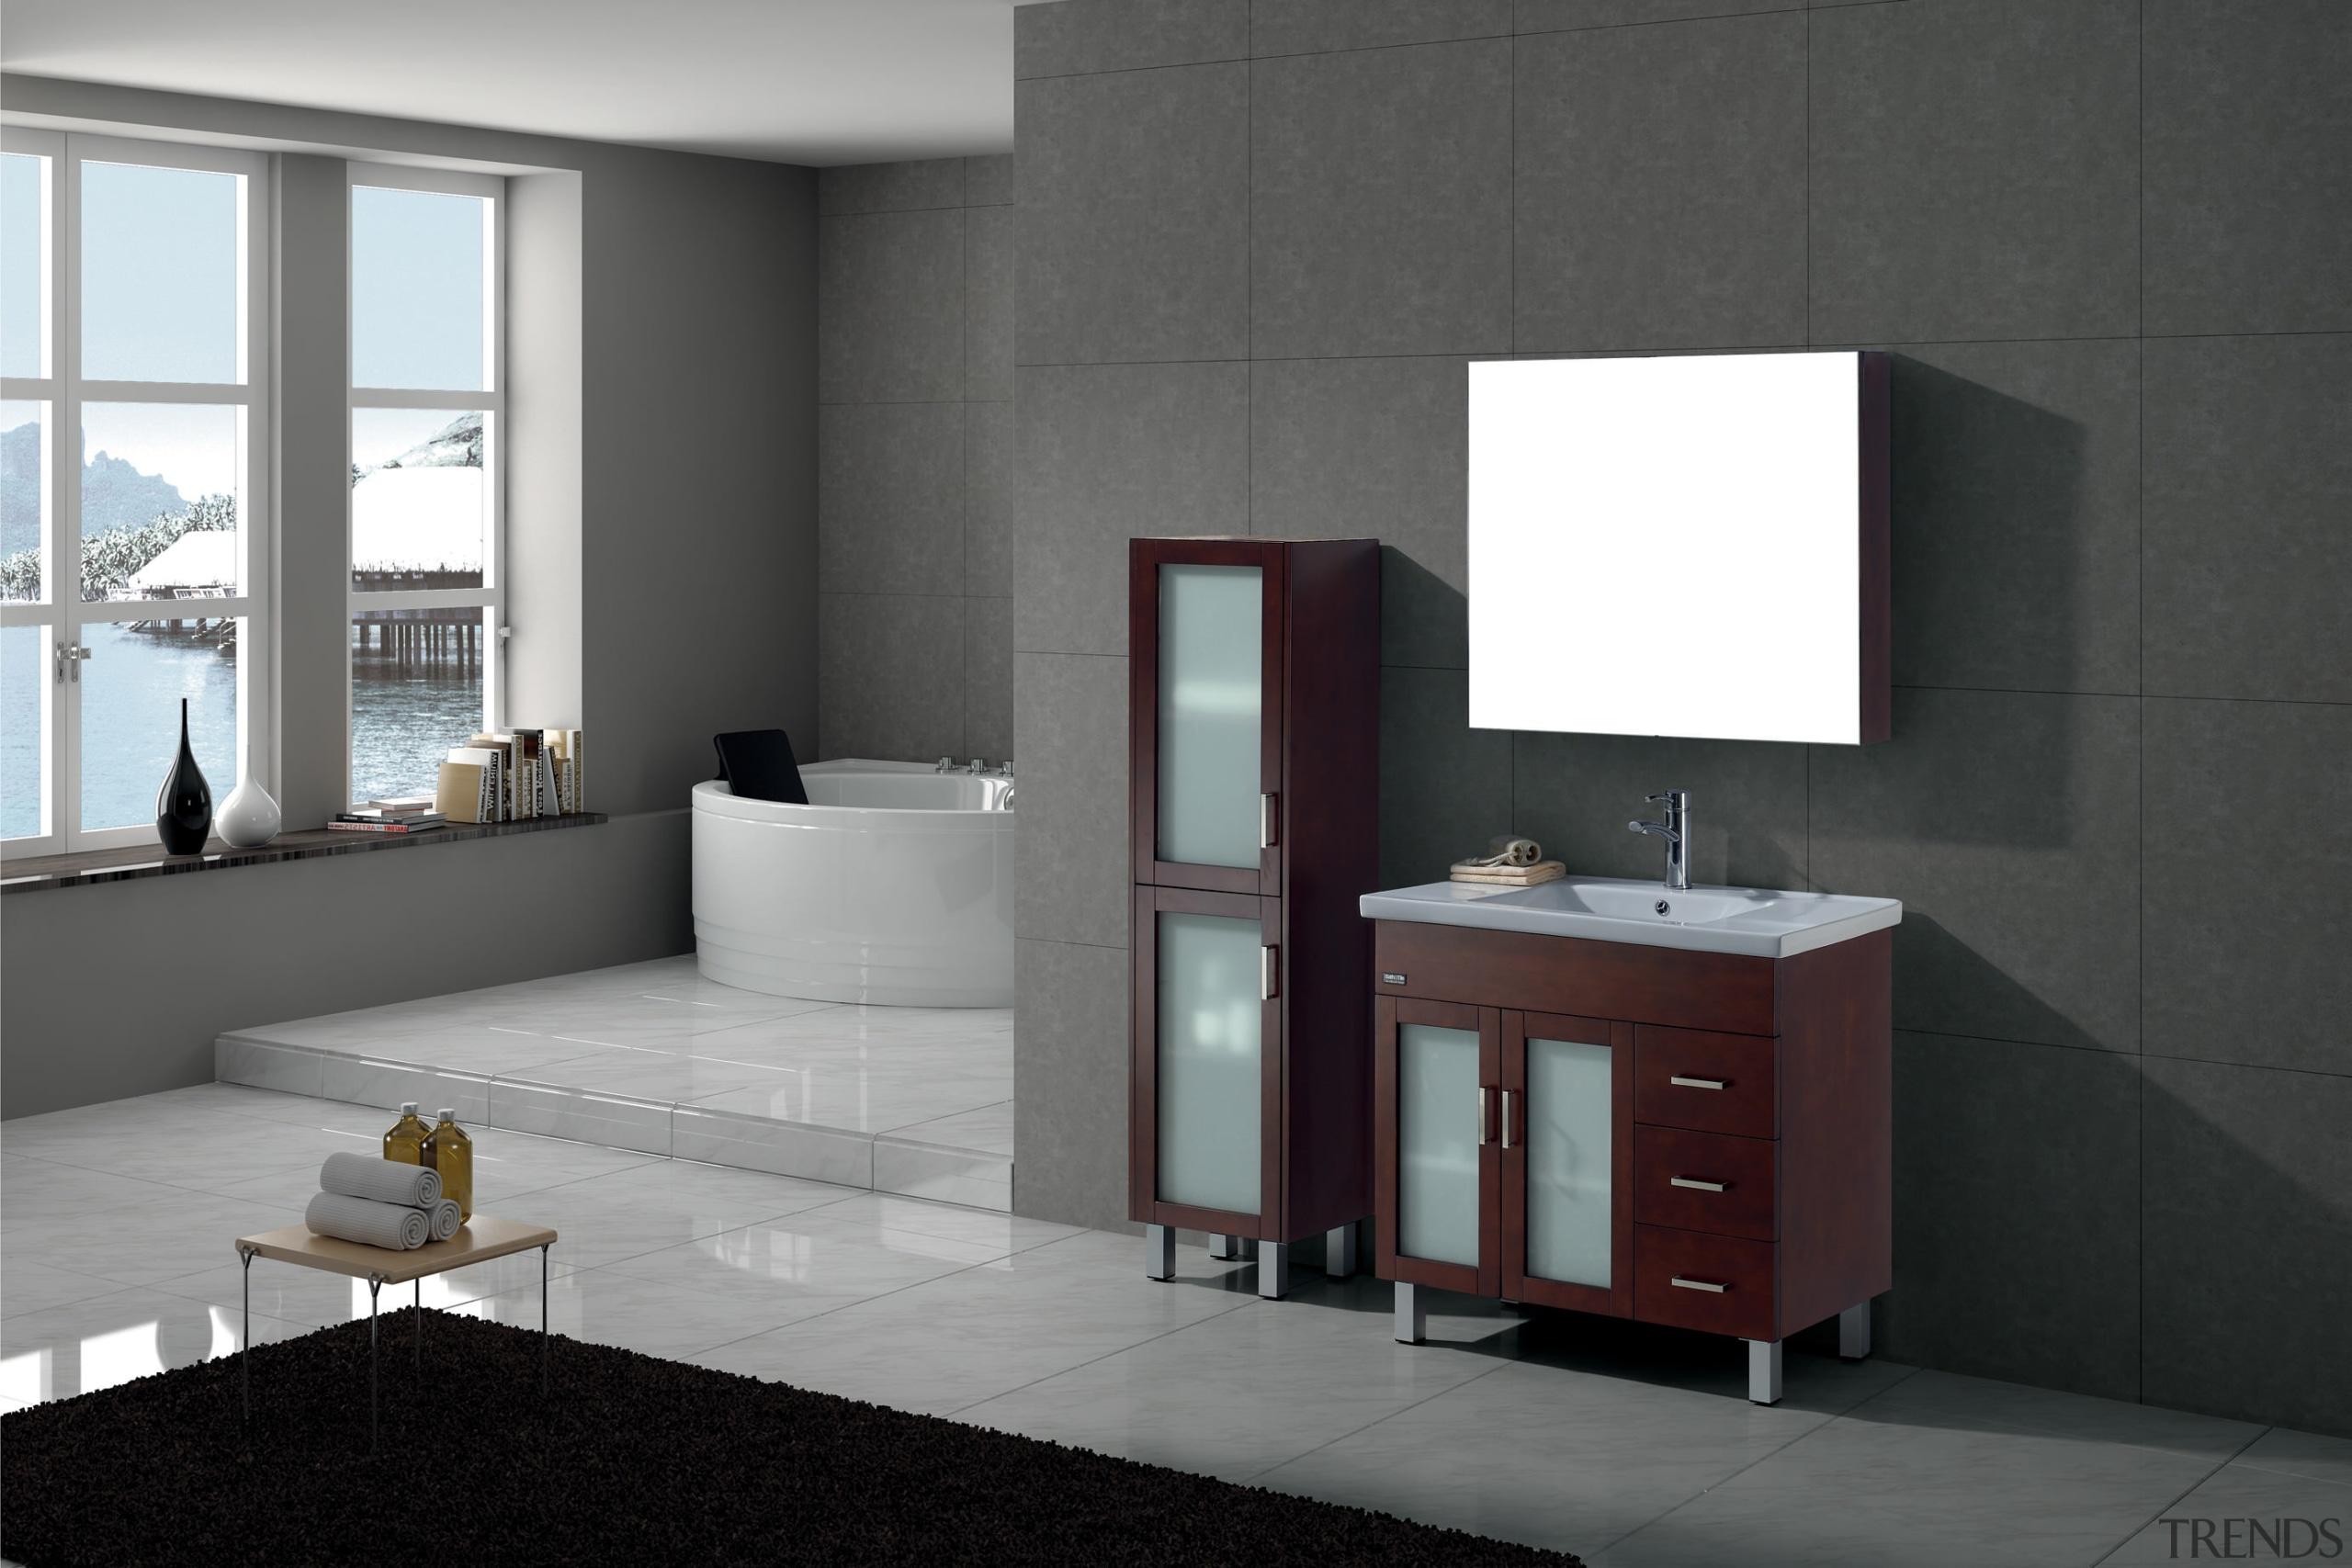 Large bathroom with a round bath tub, grey angle, bathroom, bathroom accessory, bathroom cabinet, floor, furniture, interior design, product design, room, sink, black, gray